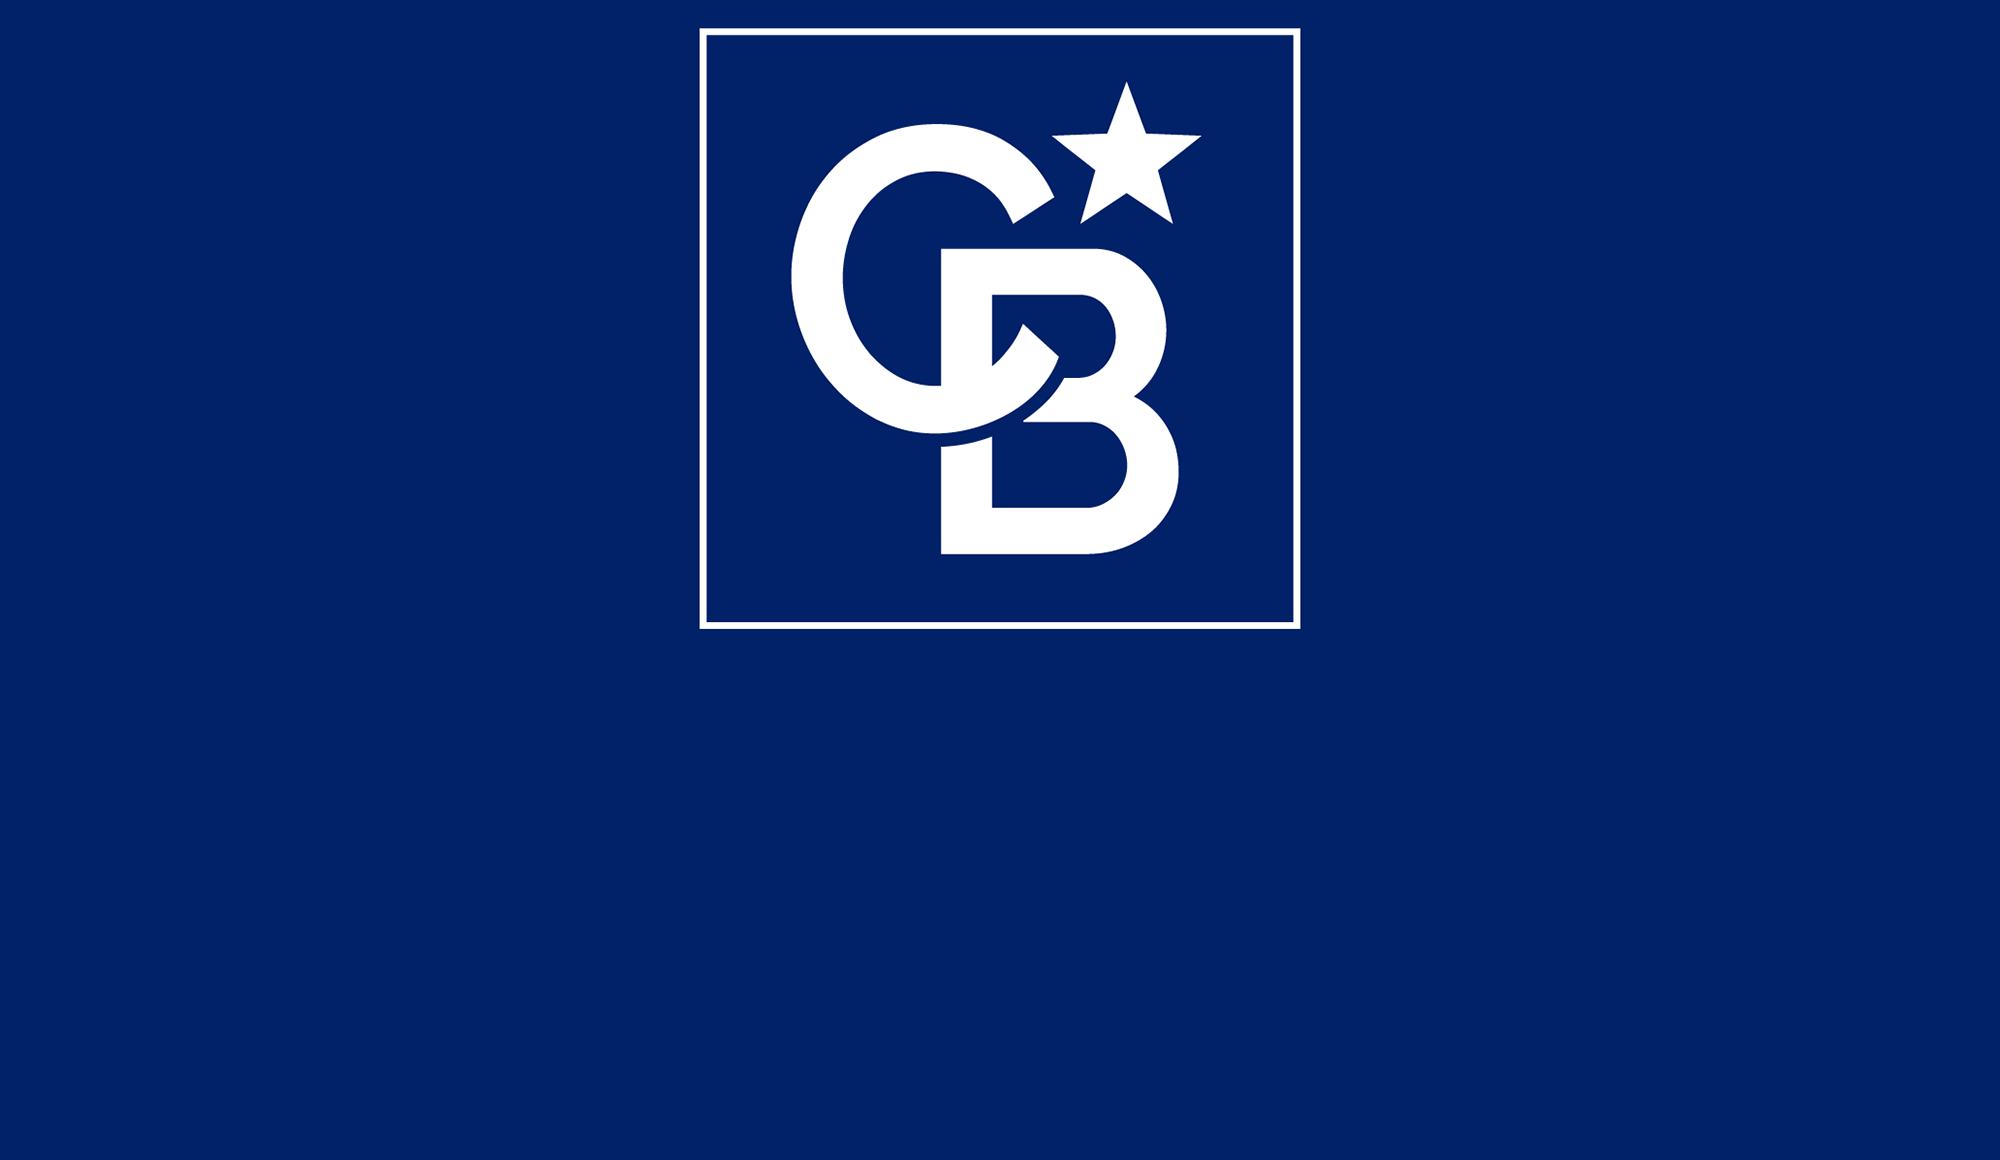 Tina Jette - Coldwell Banker Apex Realtors